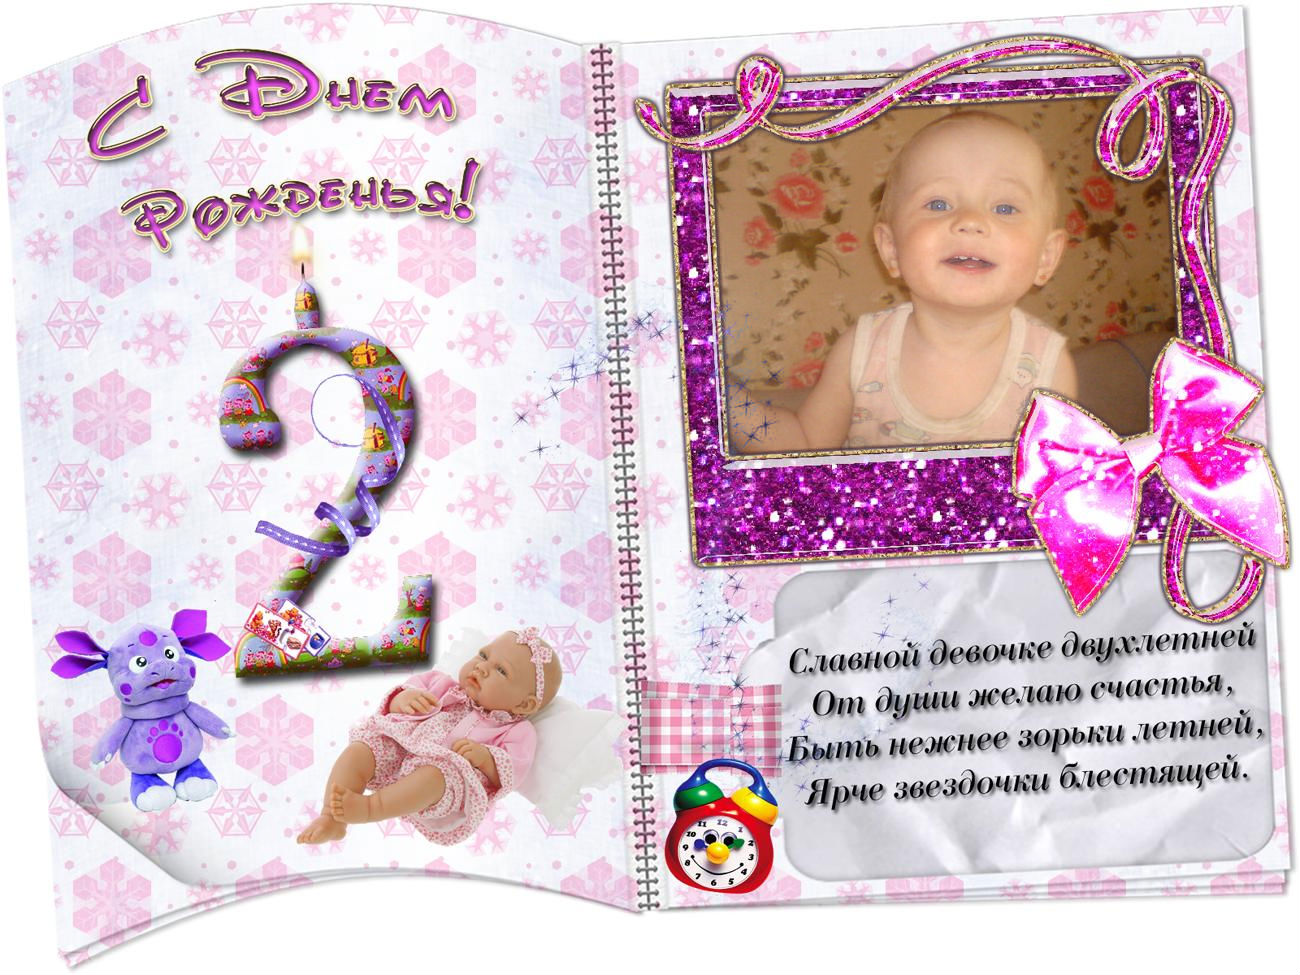 Поздравление на др на 2 годика